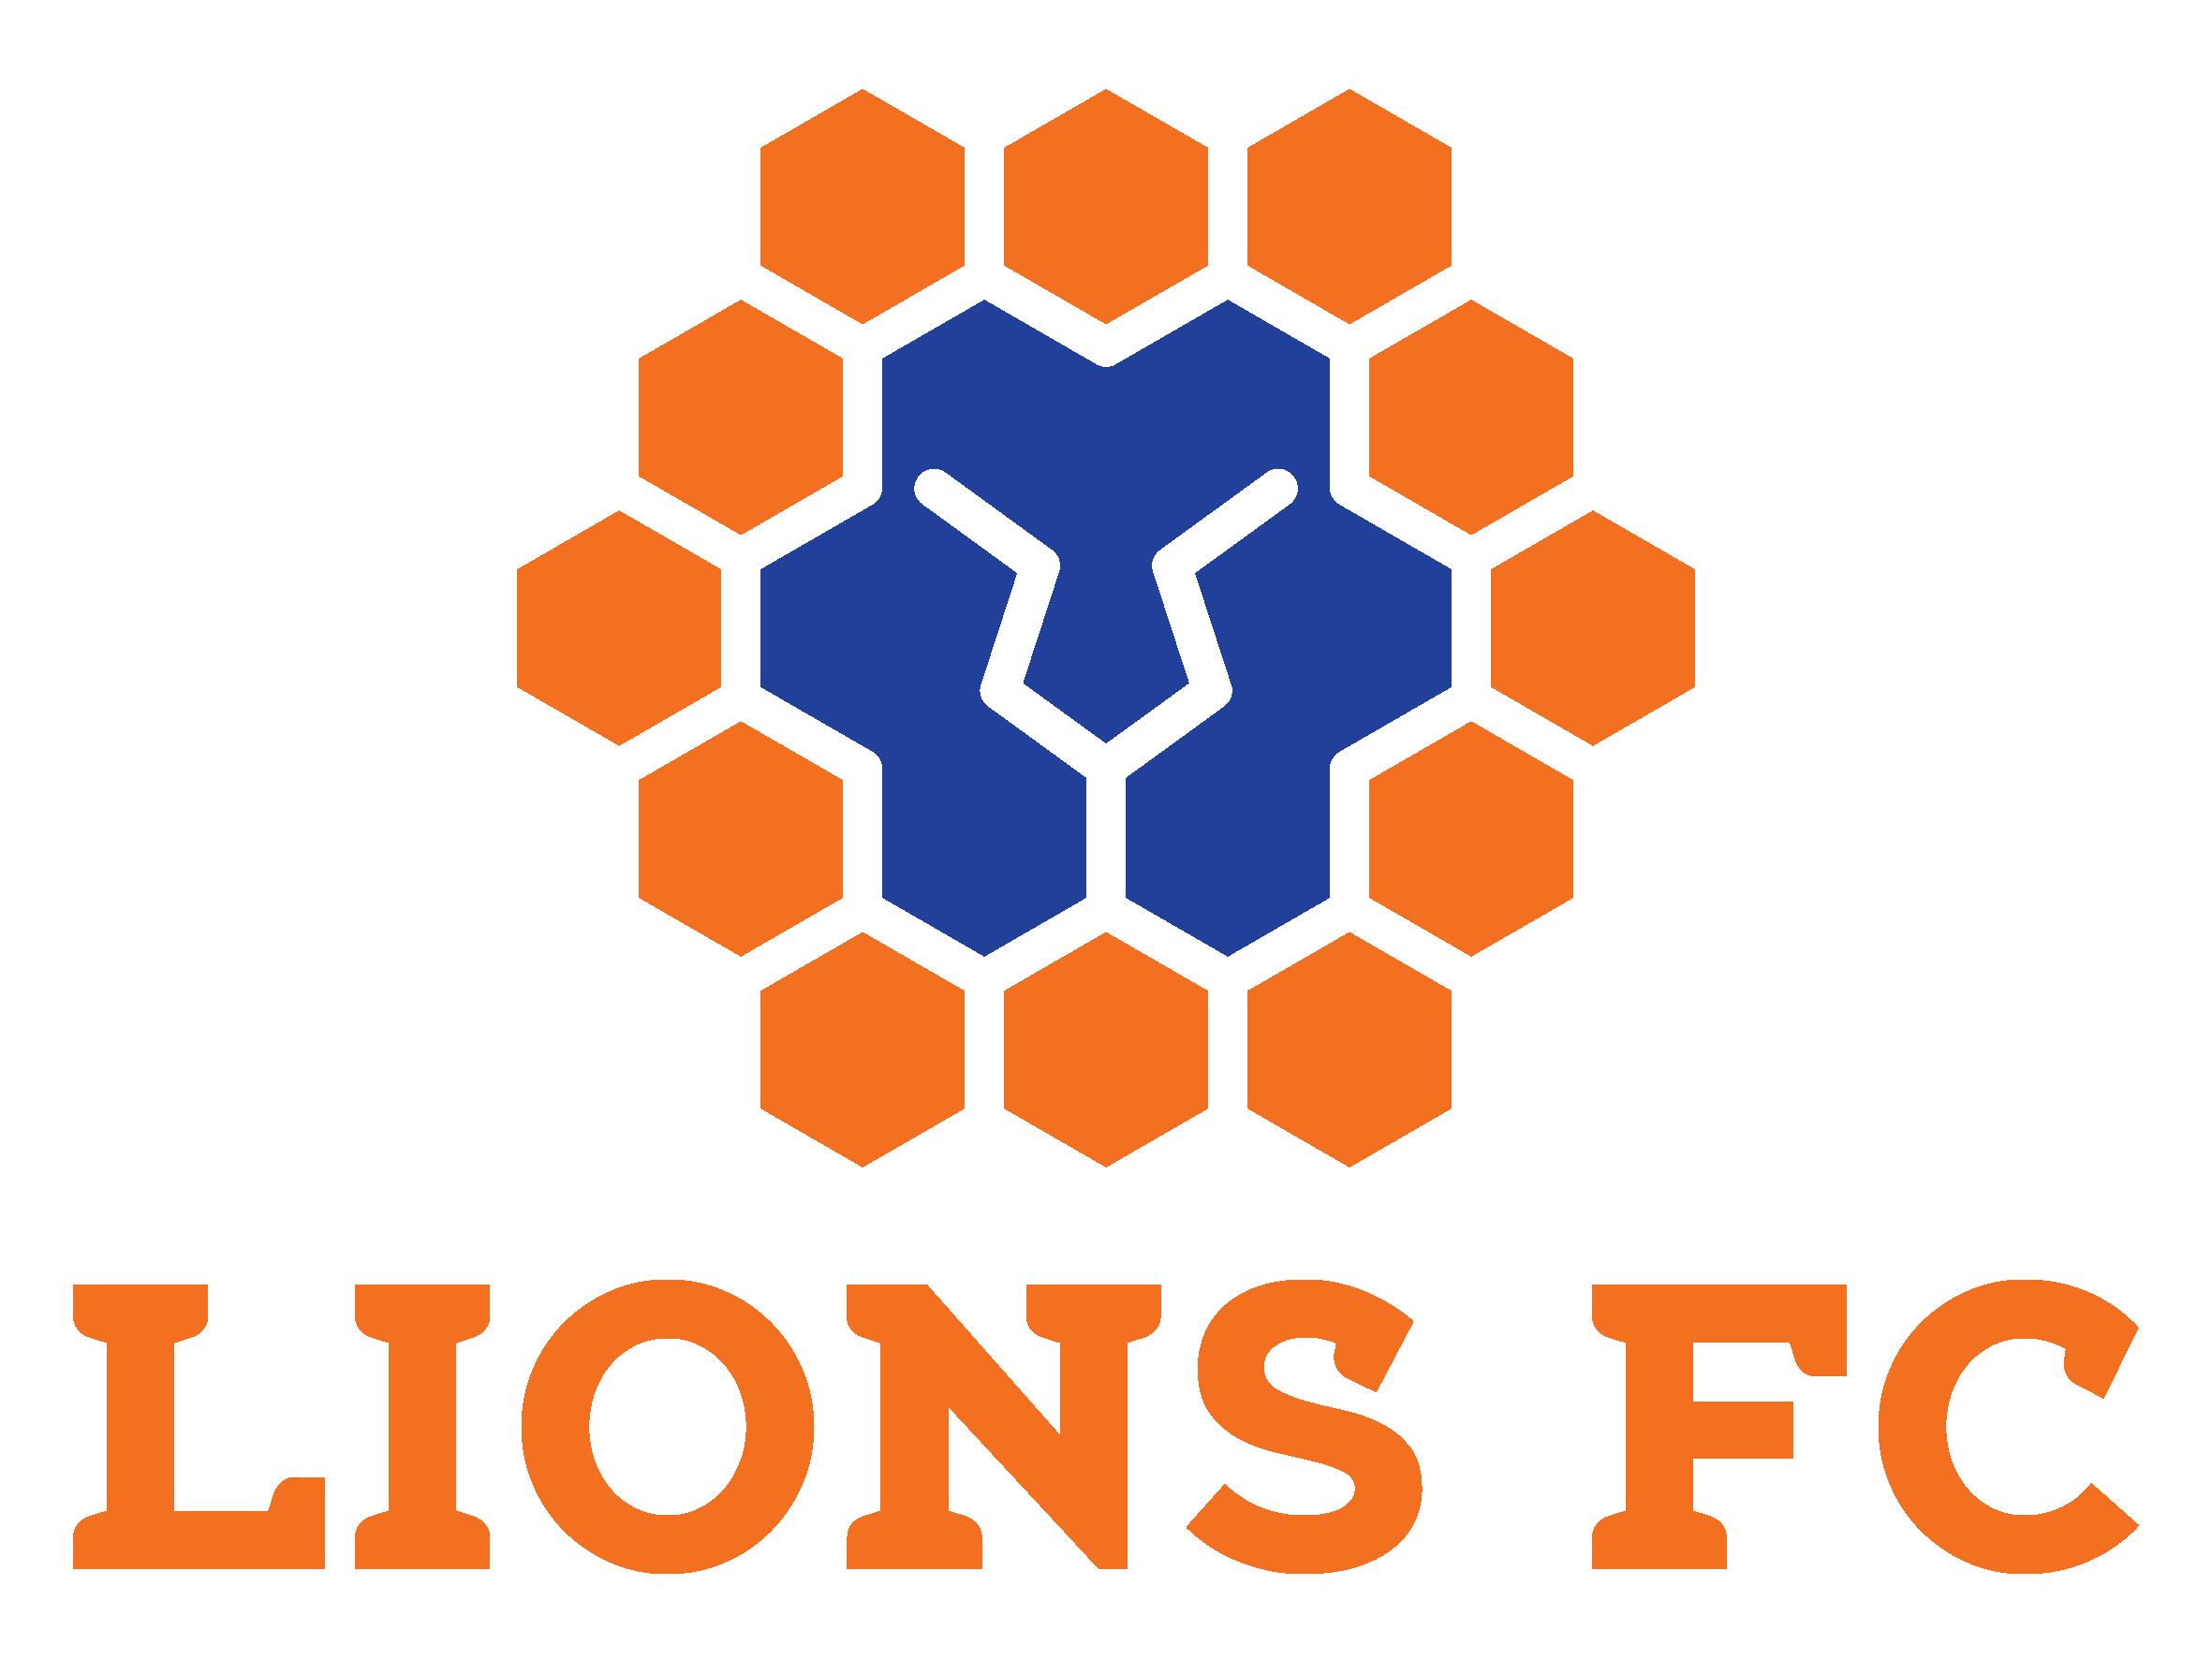 Queensland Lions team logo